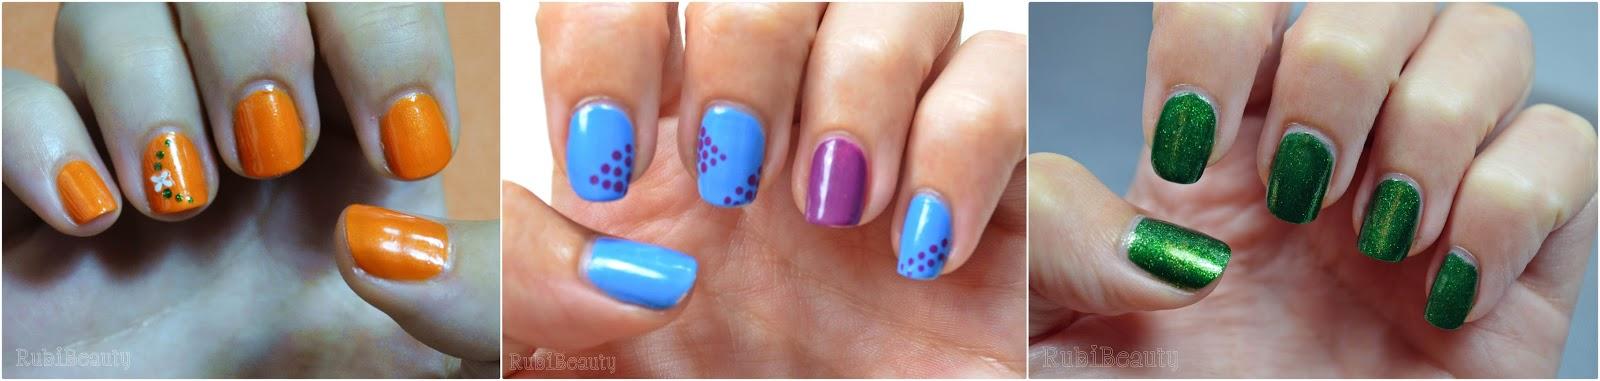 rubibeauty manicura diseño uñas faciles sencillos kiko